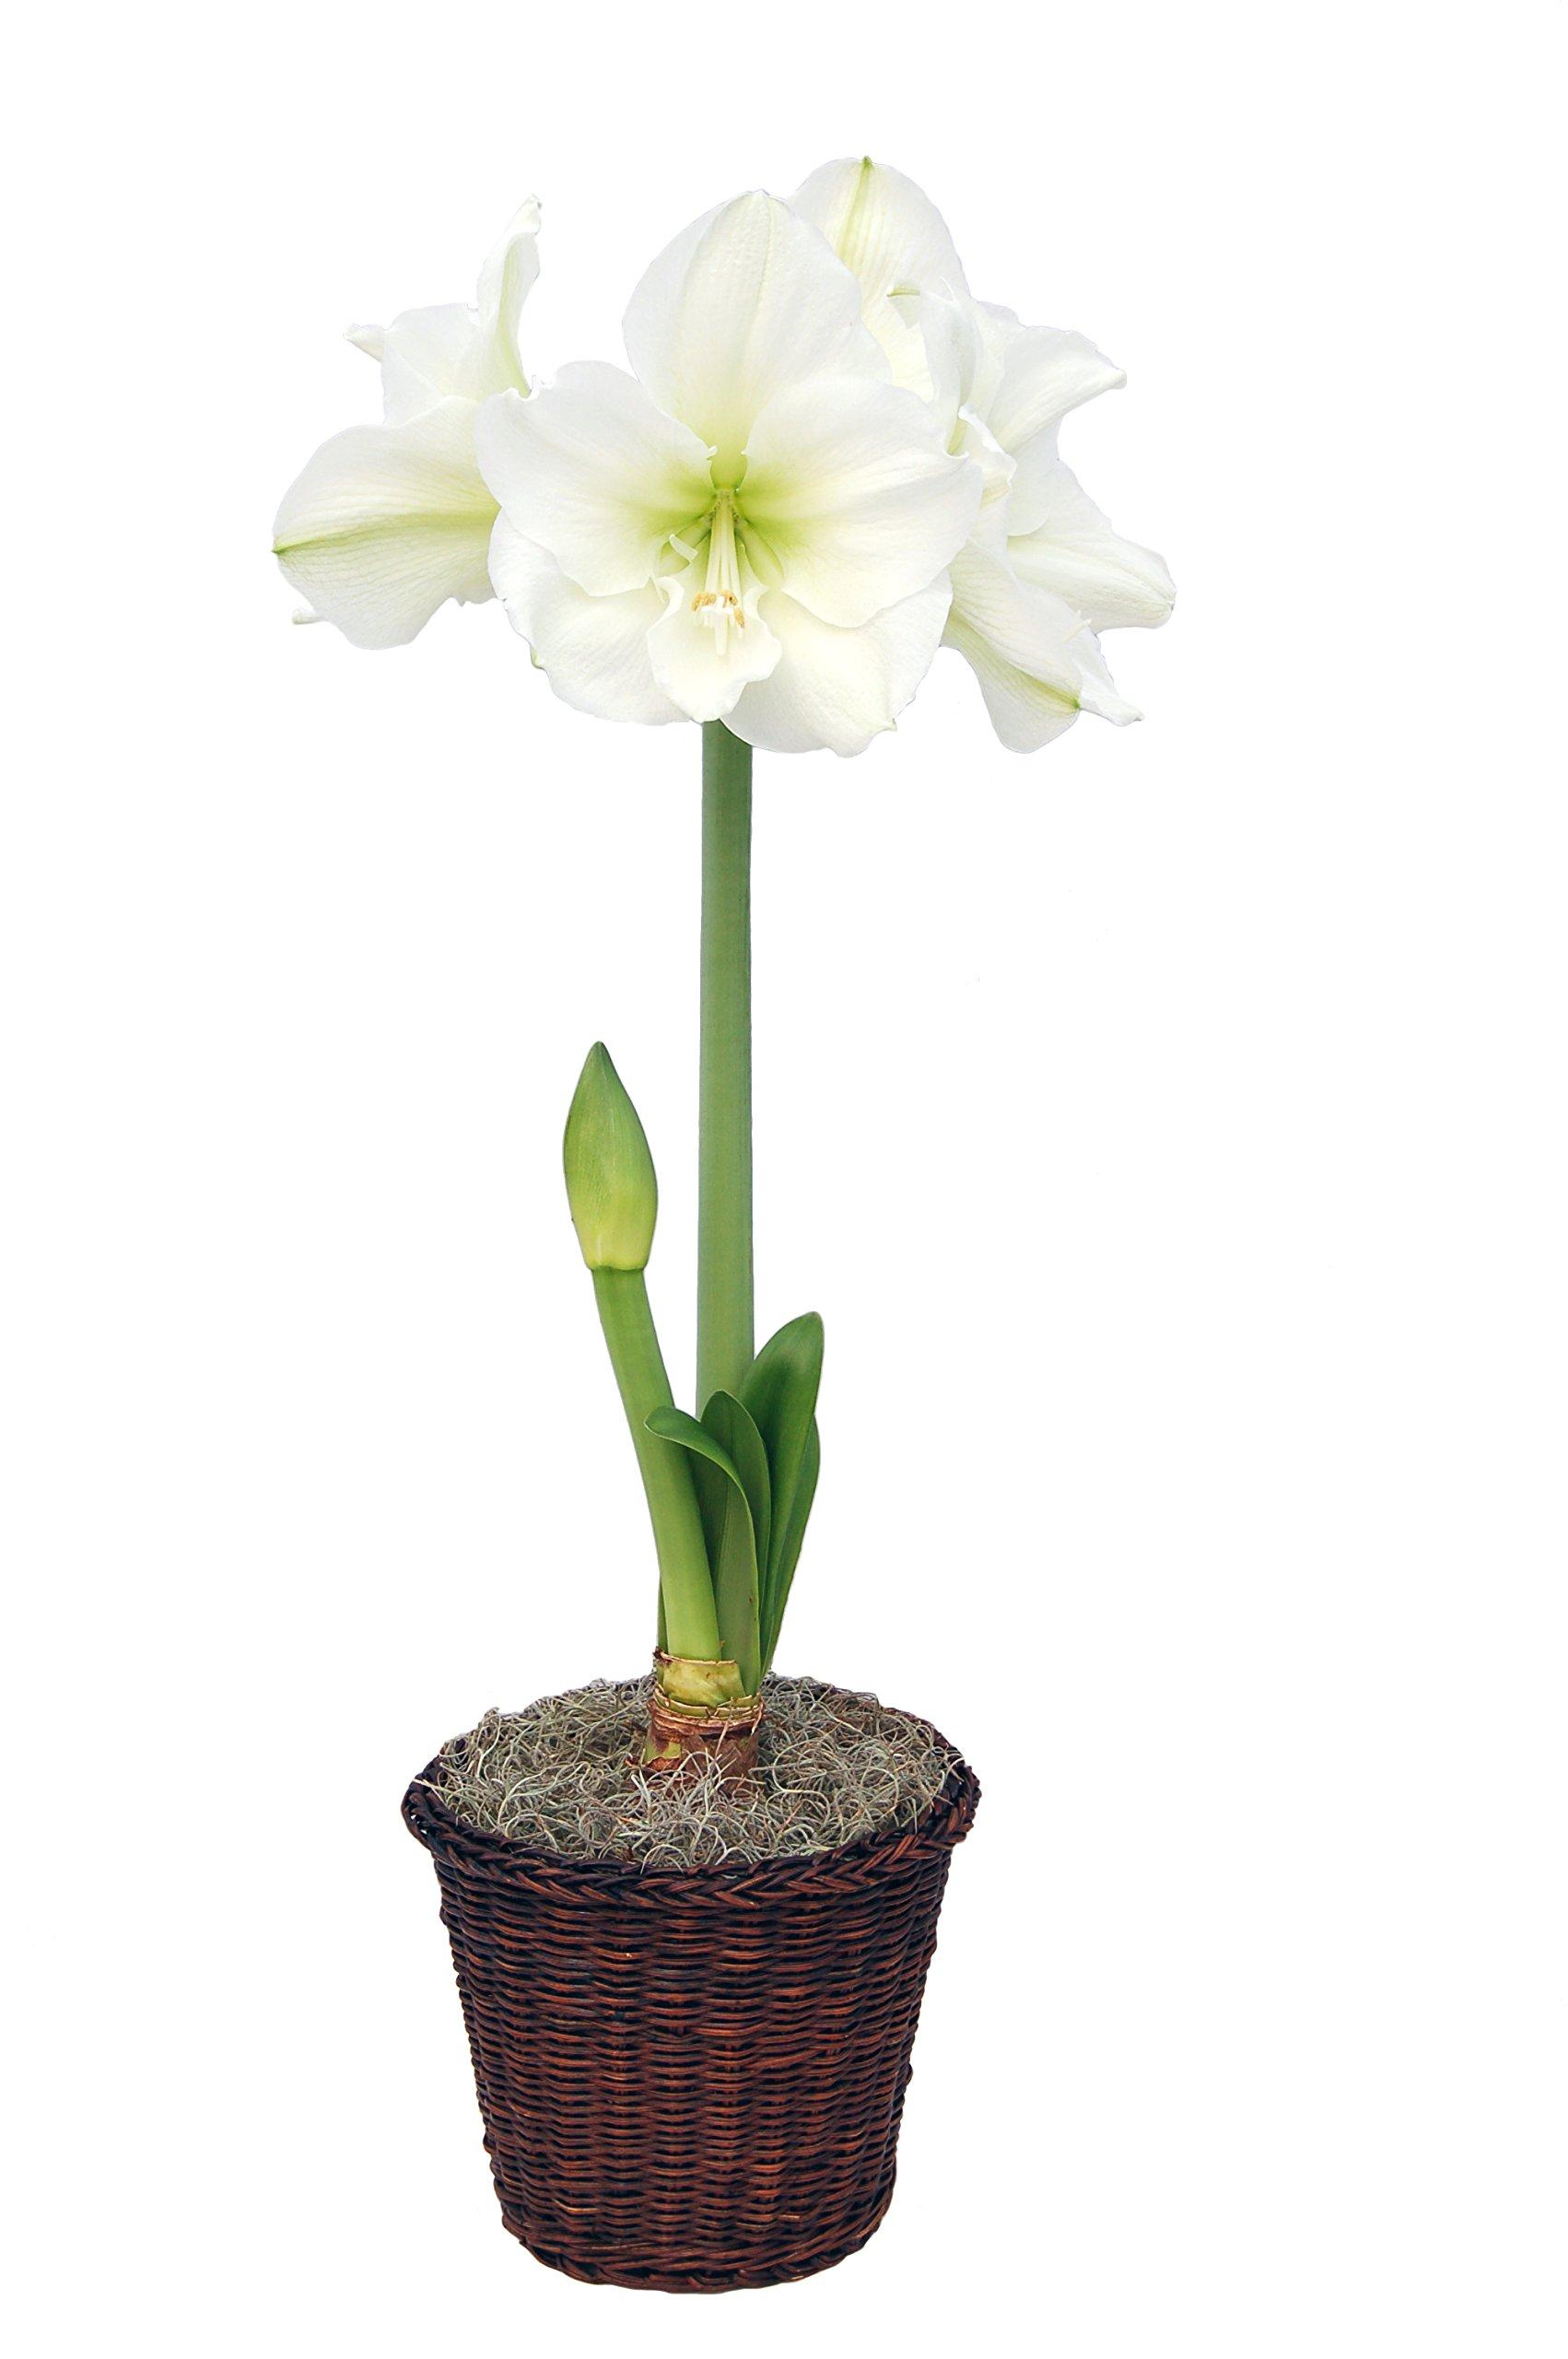 Cheap Bulb Flowers List Find Bulb Flowers List Deals On Line At